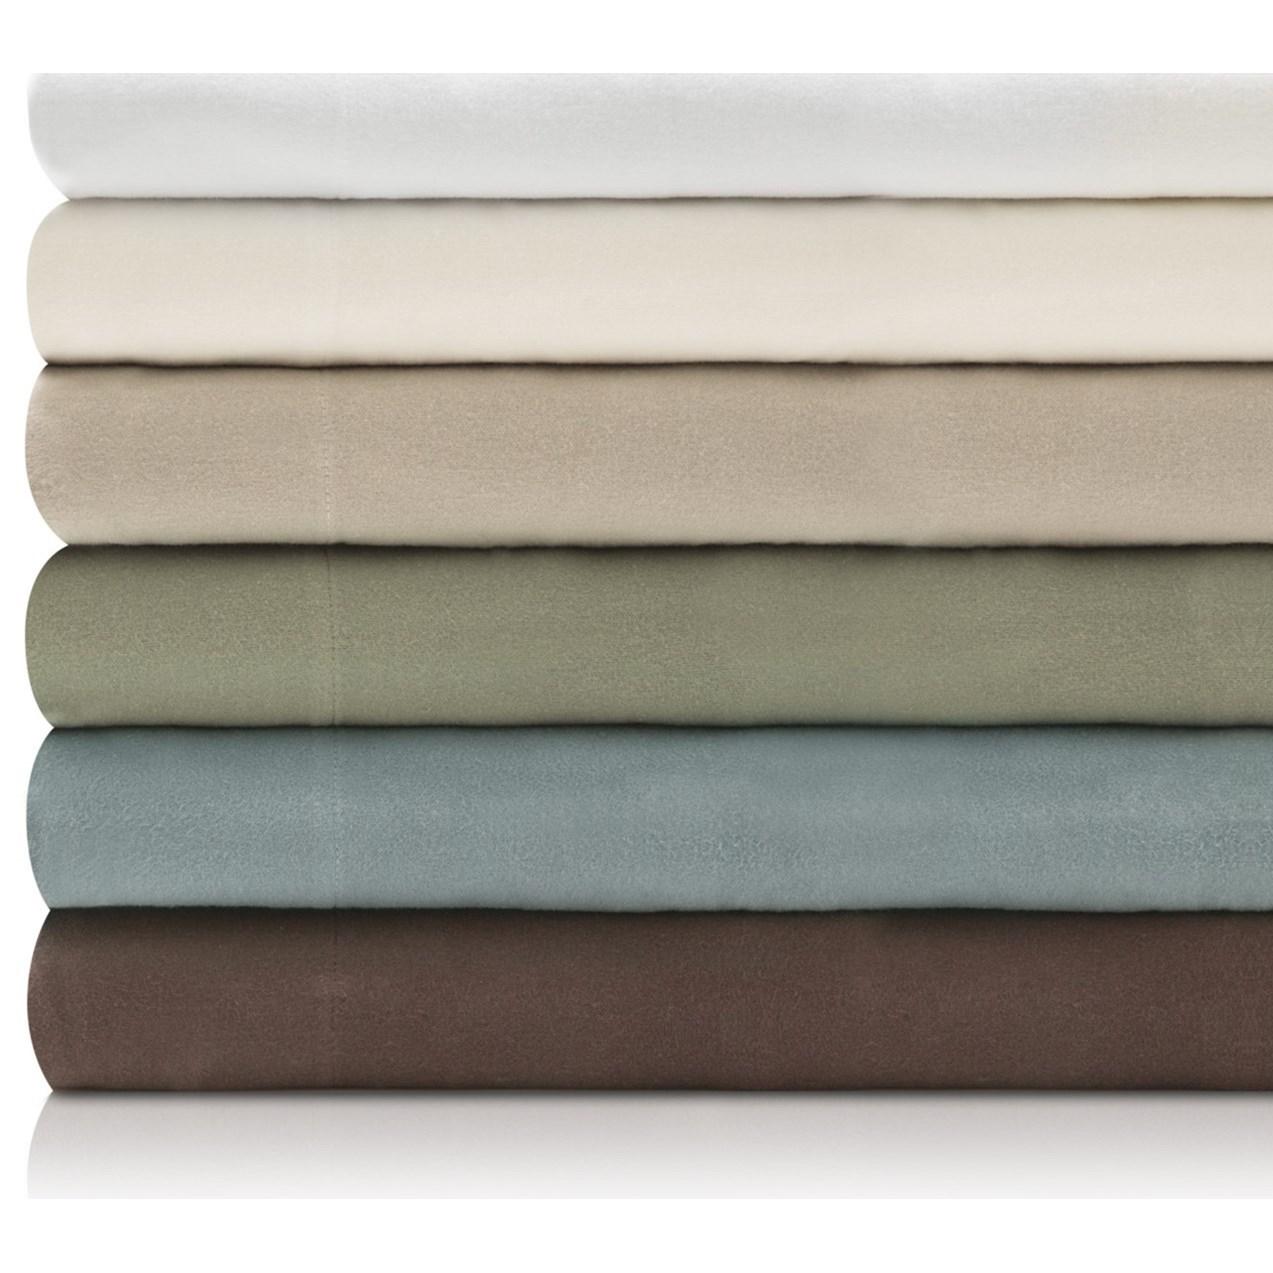 Malouf Portuguese Flannel Twin Woven™ Portuguese Flannel Sheet Set - Item Number: WO19TTPNFS